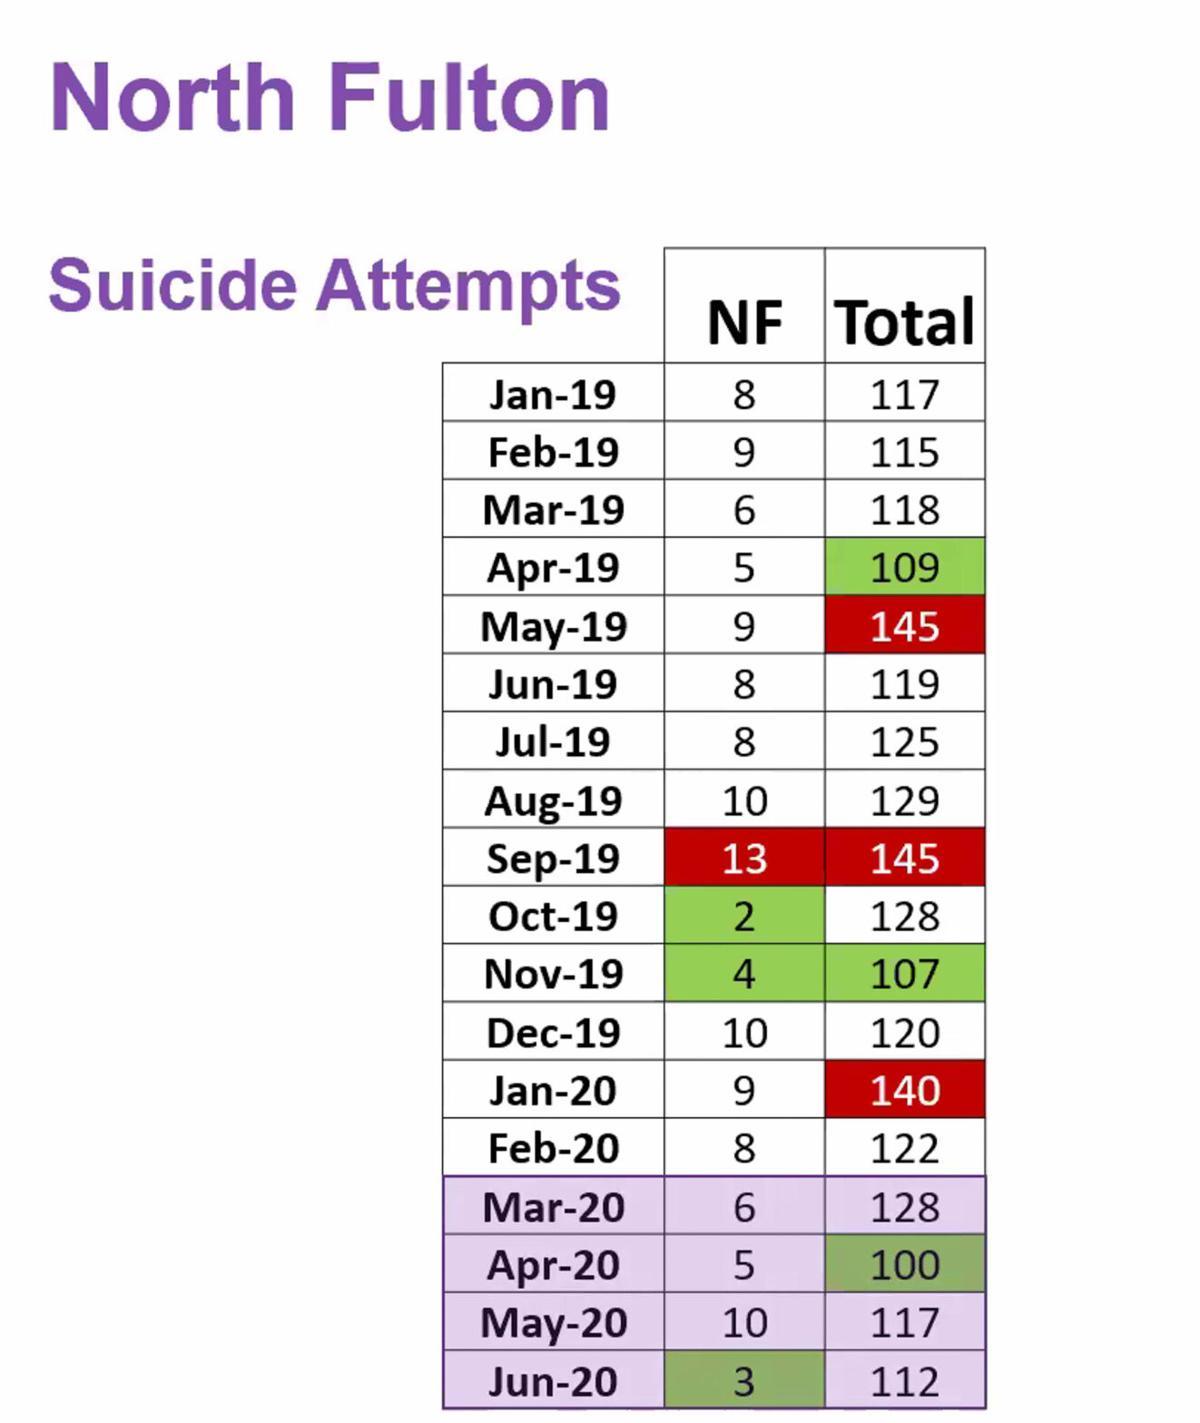 North Fulton Suicide Attempts